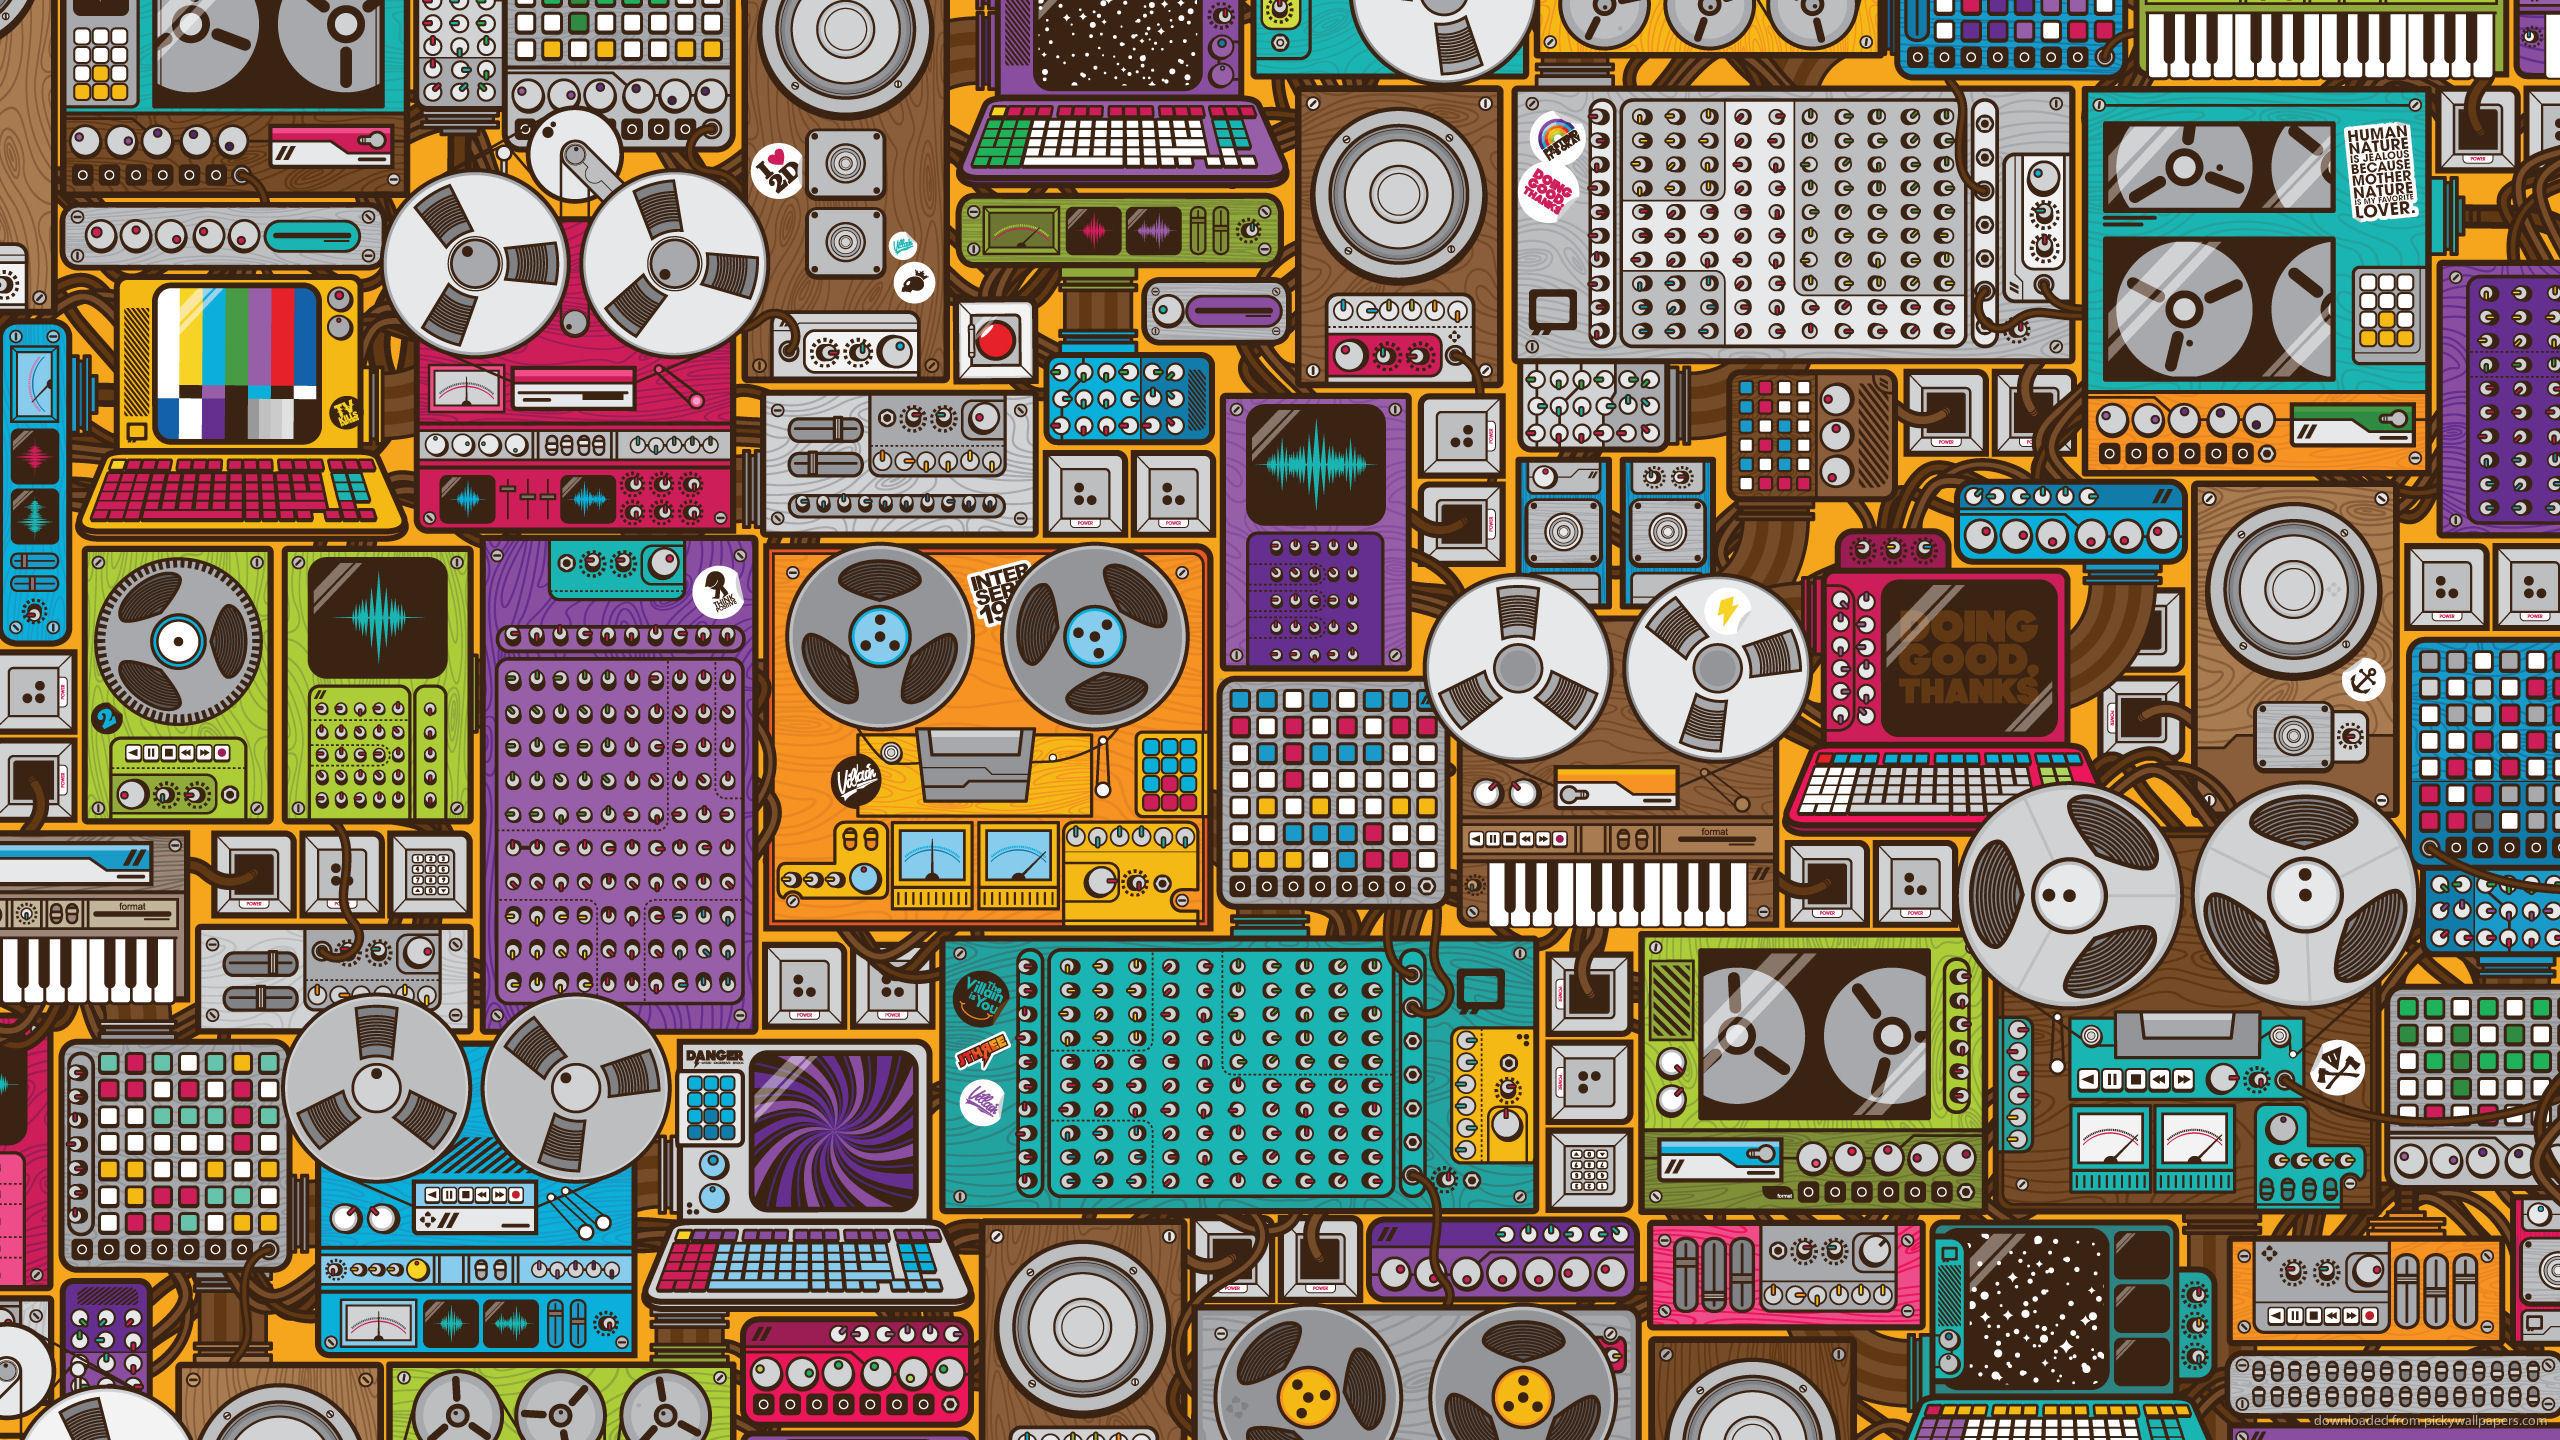 retro music wallpaper devices pattern 2560x1440